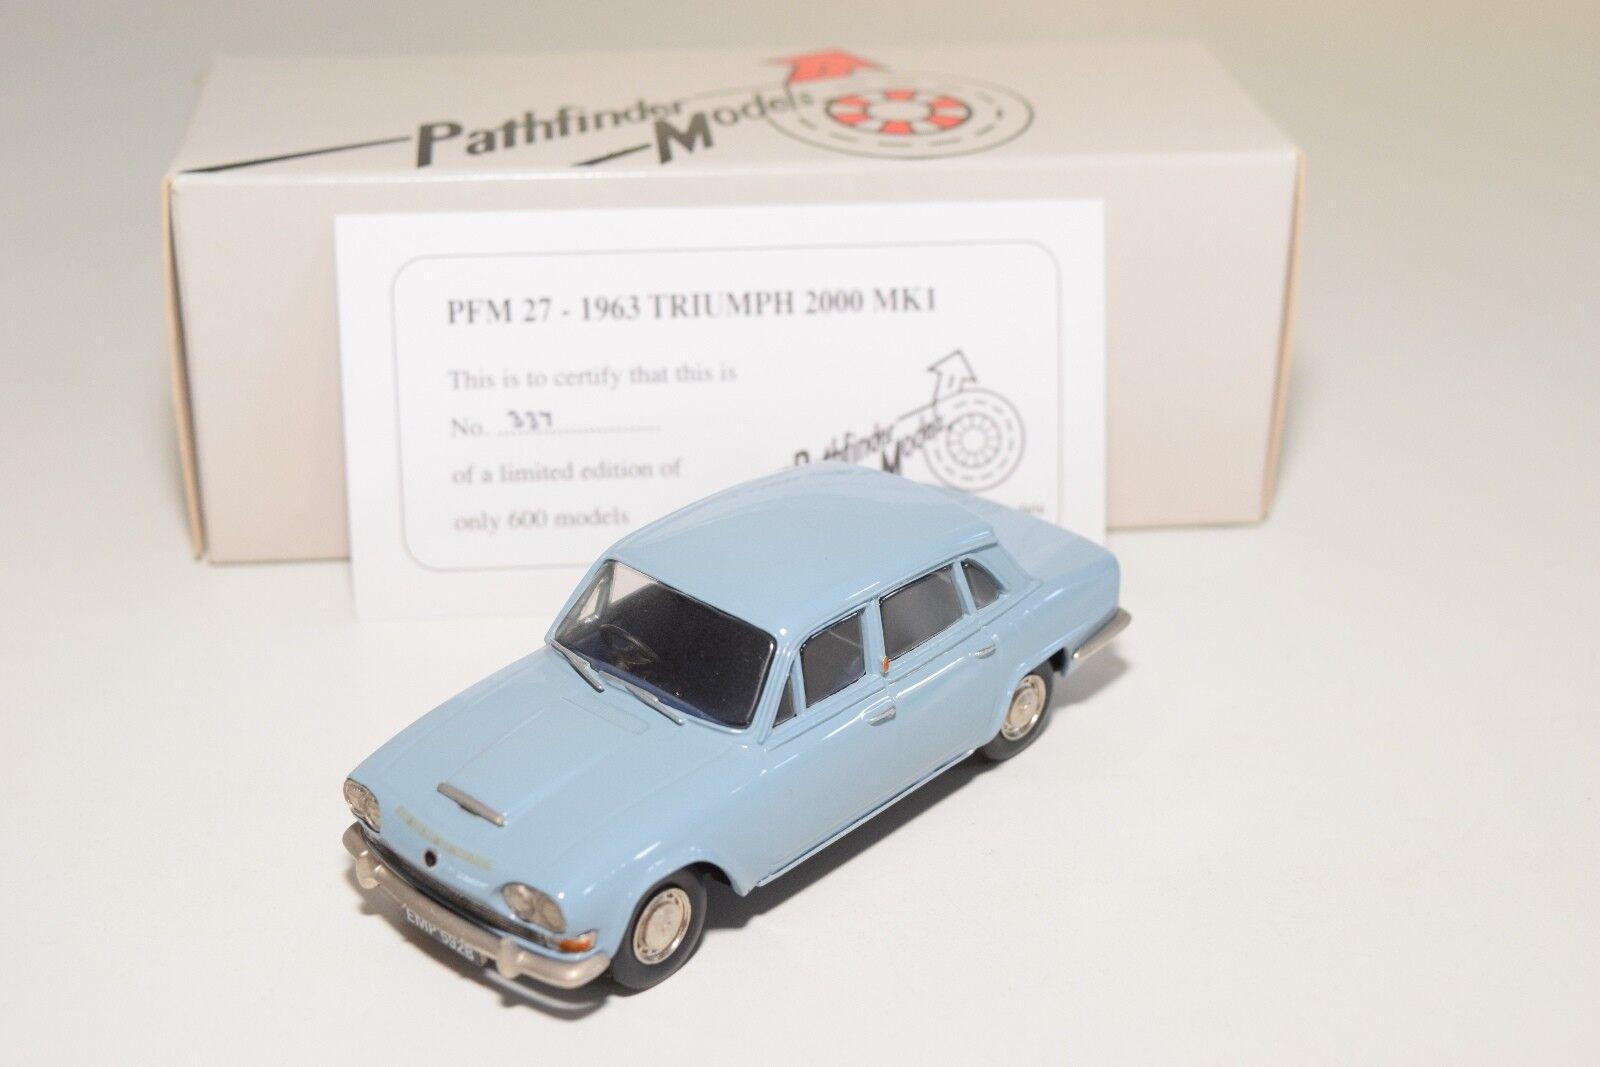 preferente  PATHFINDER MODELS PFM27 PFM 27 1963 TRIUMPH TRIUMPH TRIUMPH 2000 MKI azul MINT BOXED 337 600  ahorrar en el despacho